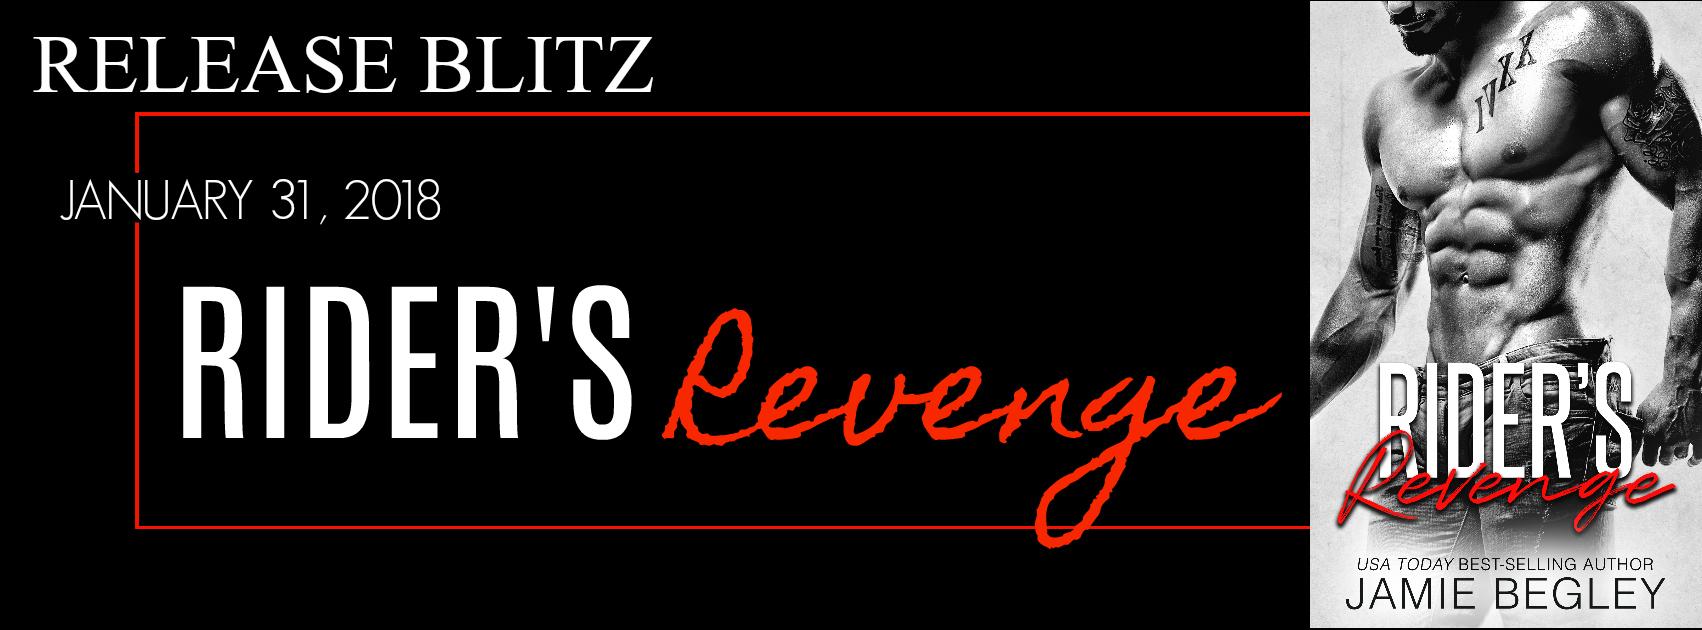 Release Blitz: Rider's Revenge by Jamie Begley